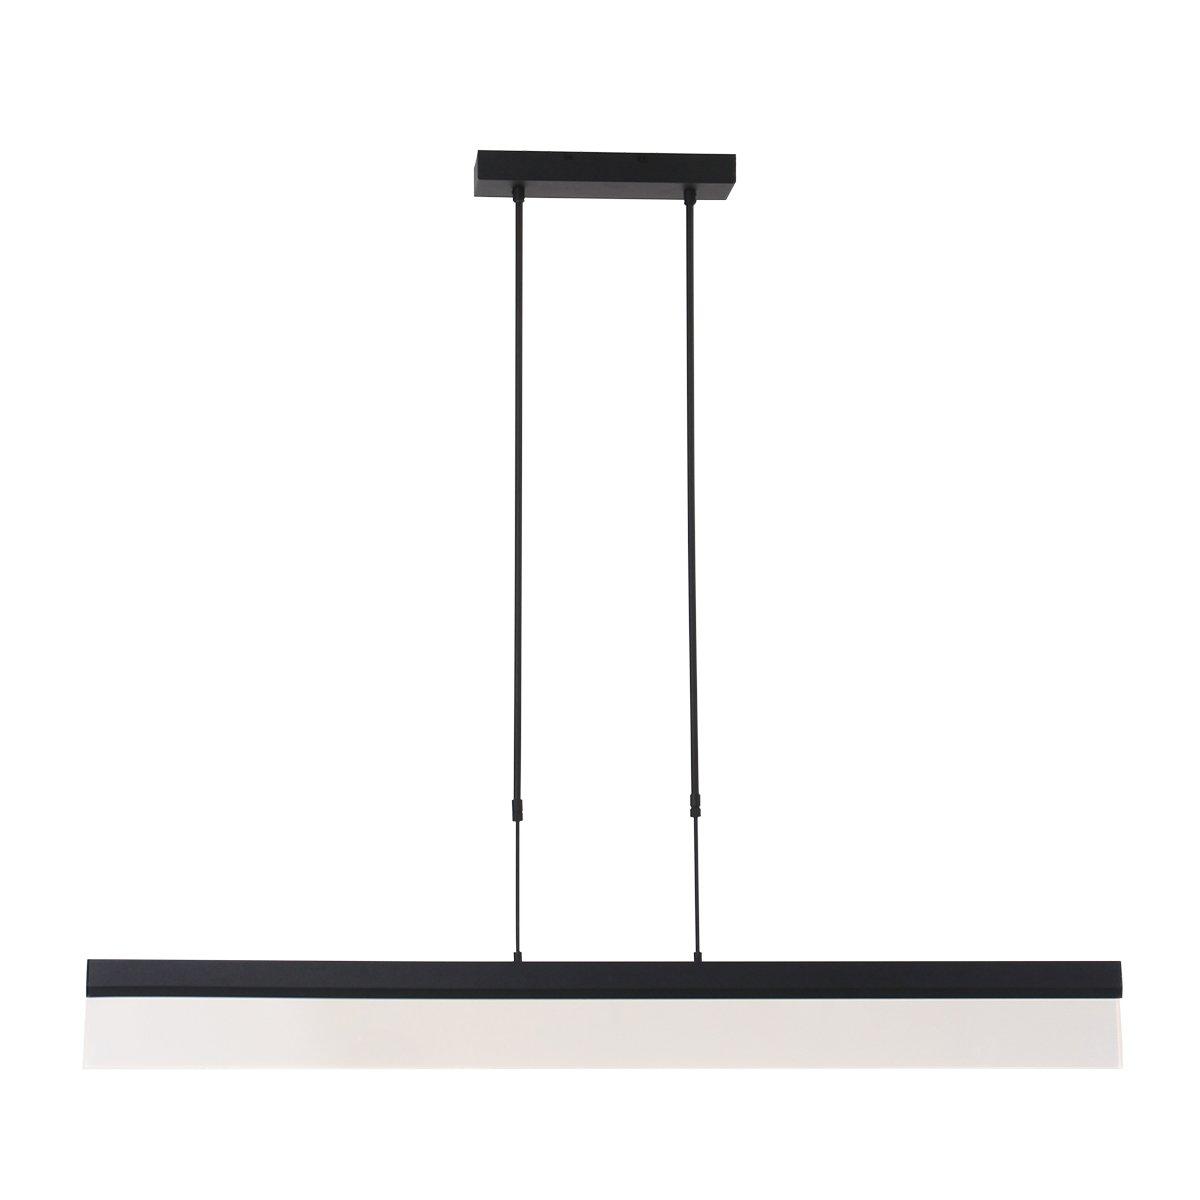 Hanglamp Steinhauer Atletiche Zwart Kleurinstelbaar